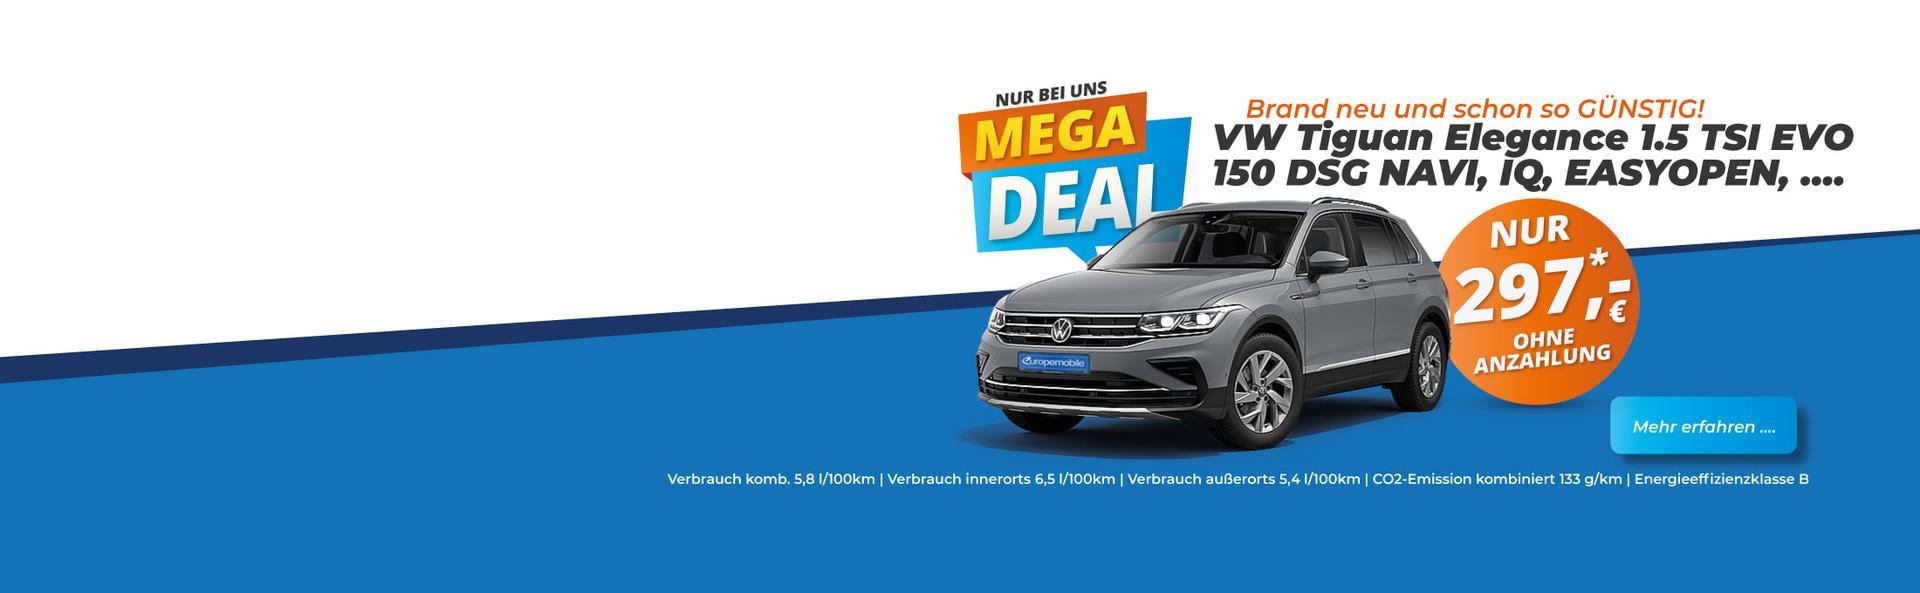 Angebot EU Neuwagen Leasing VW Tiguan